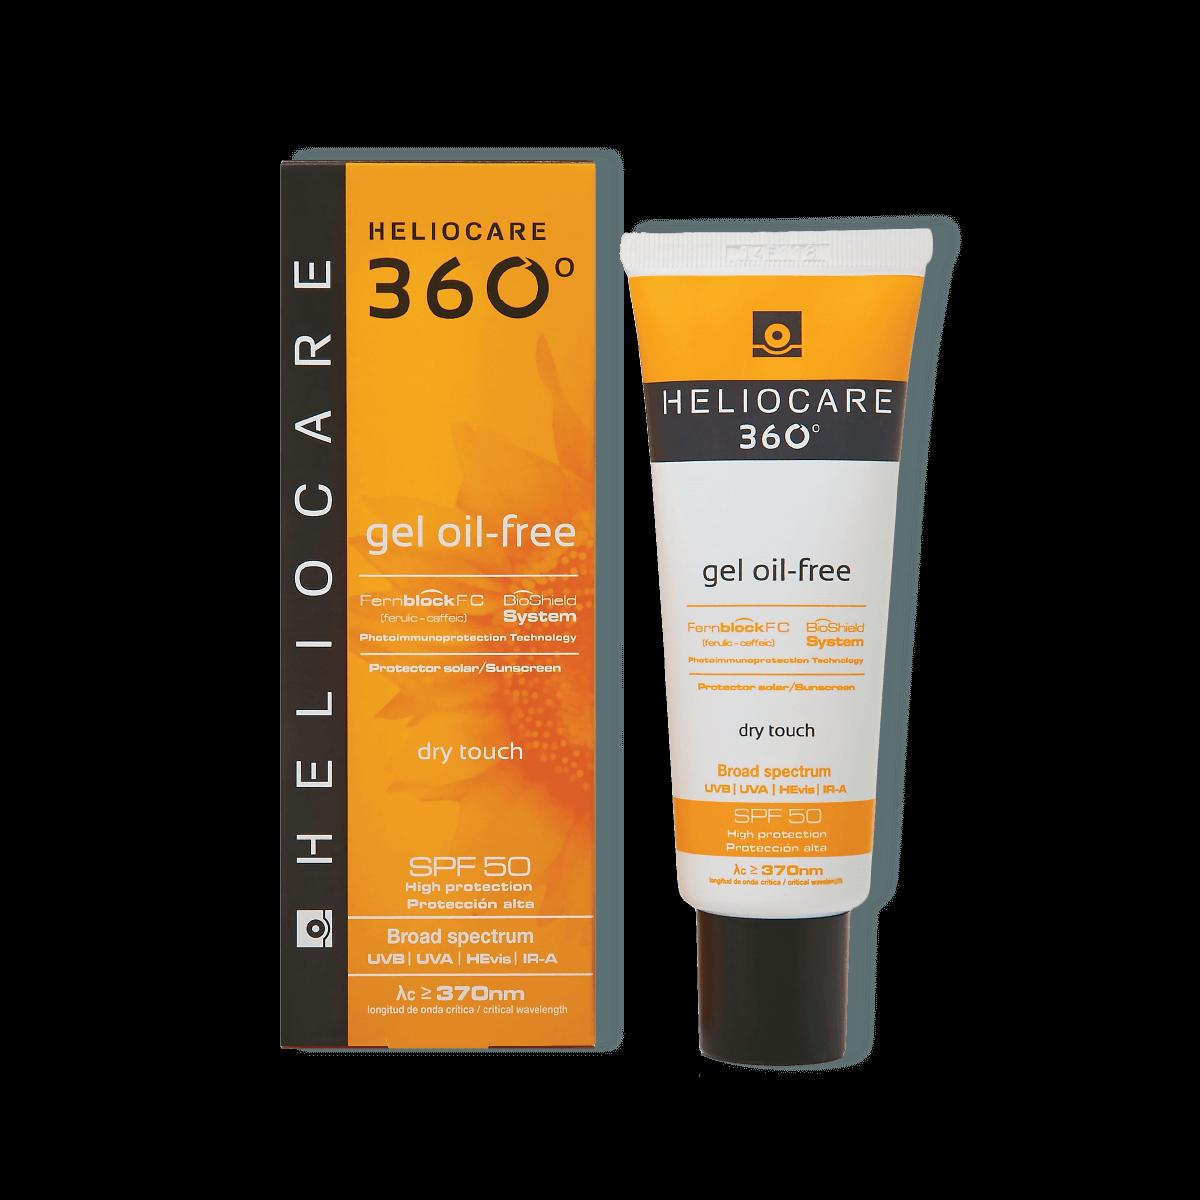 Heliocare 360° Oil Free gel SPF 50 50ml